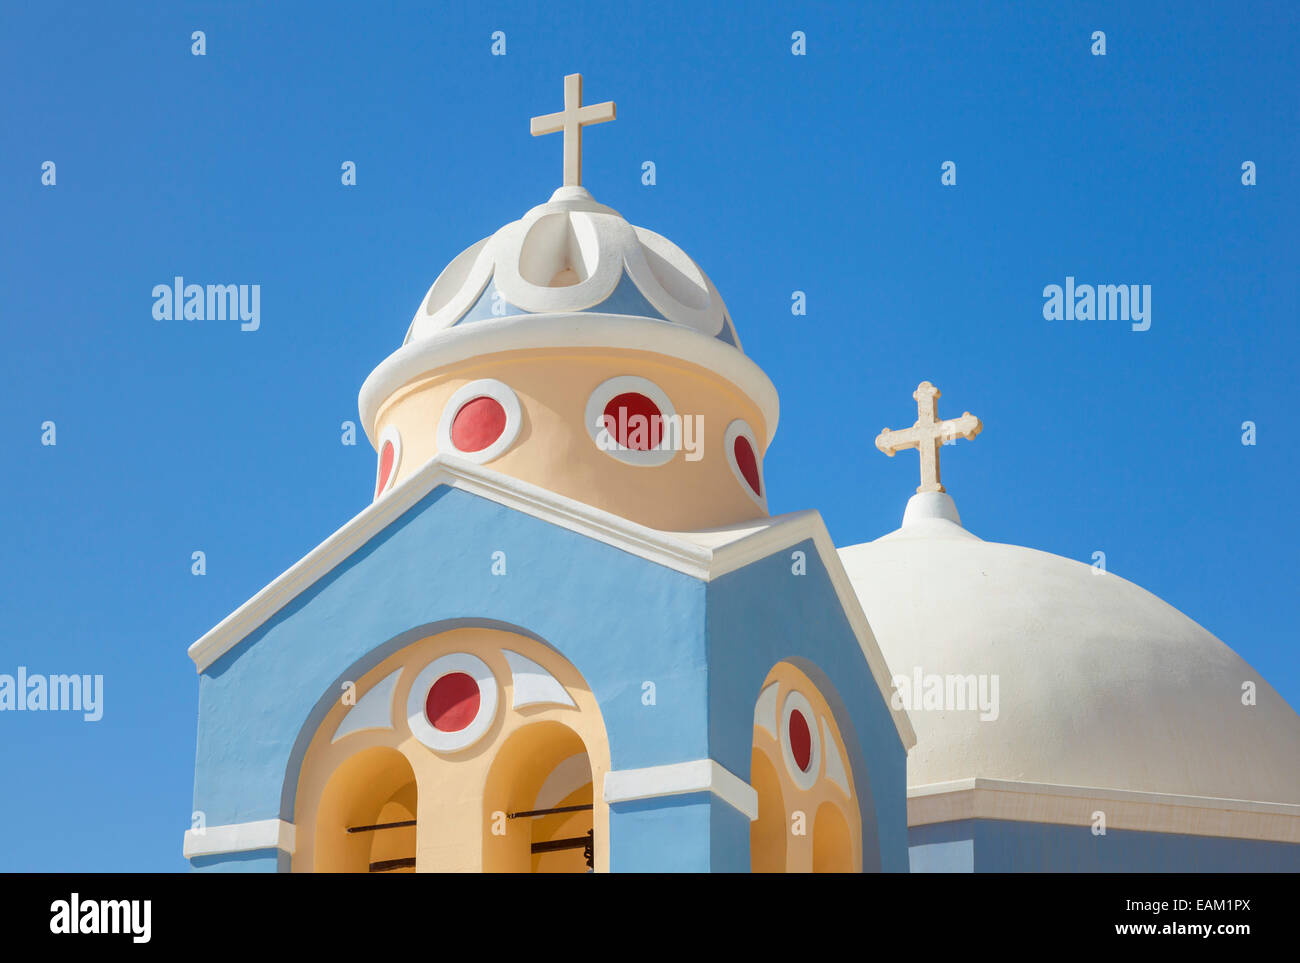 Catholic Church of Saint Stylianos, Fira, Santorini, Thira, Cyclades islands, Aegean Sea, Greece, EU, Europe - Stock Image